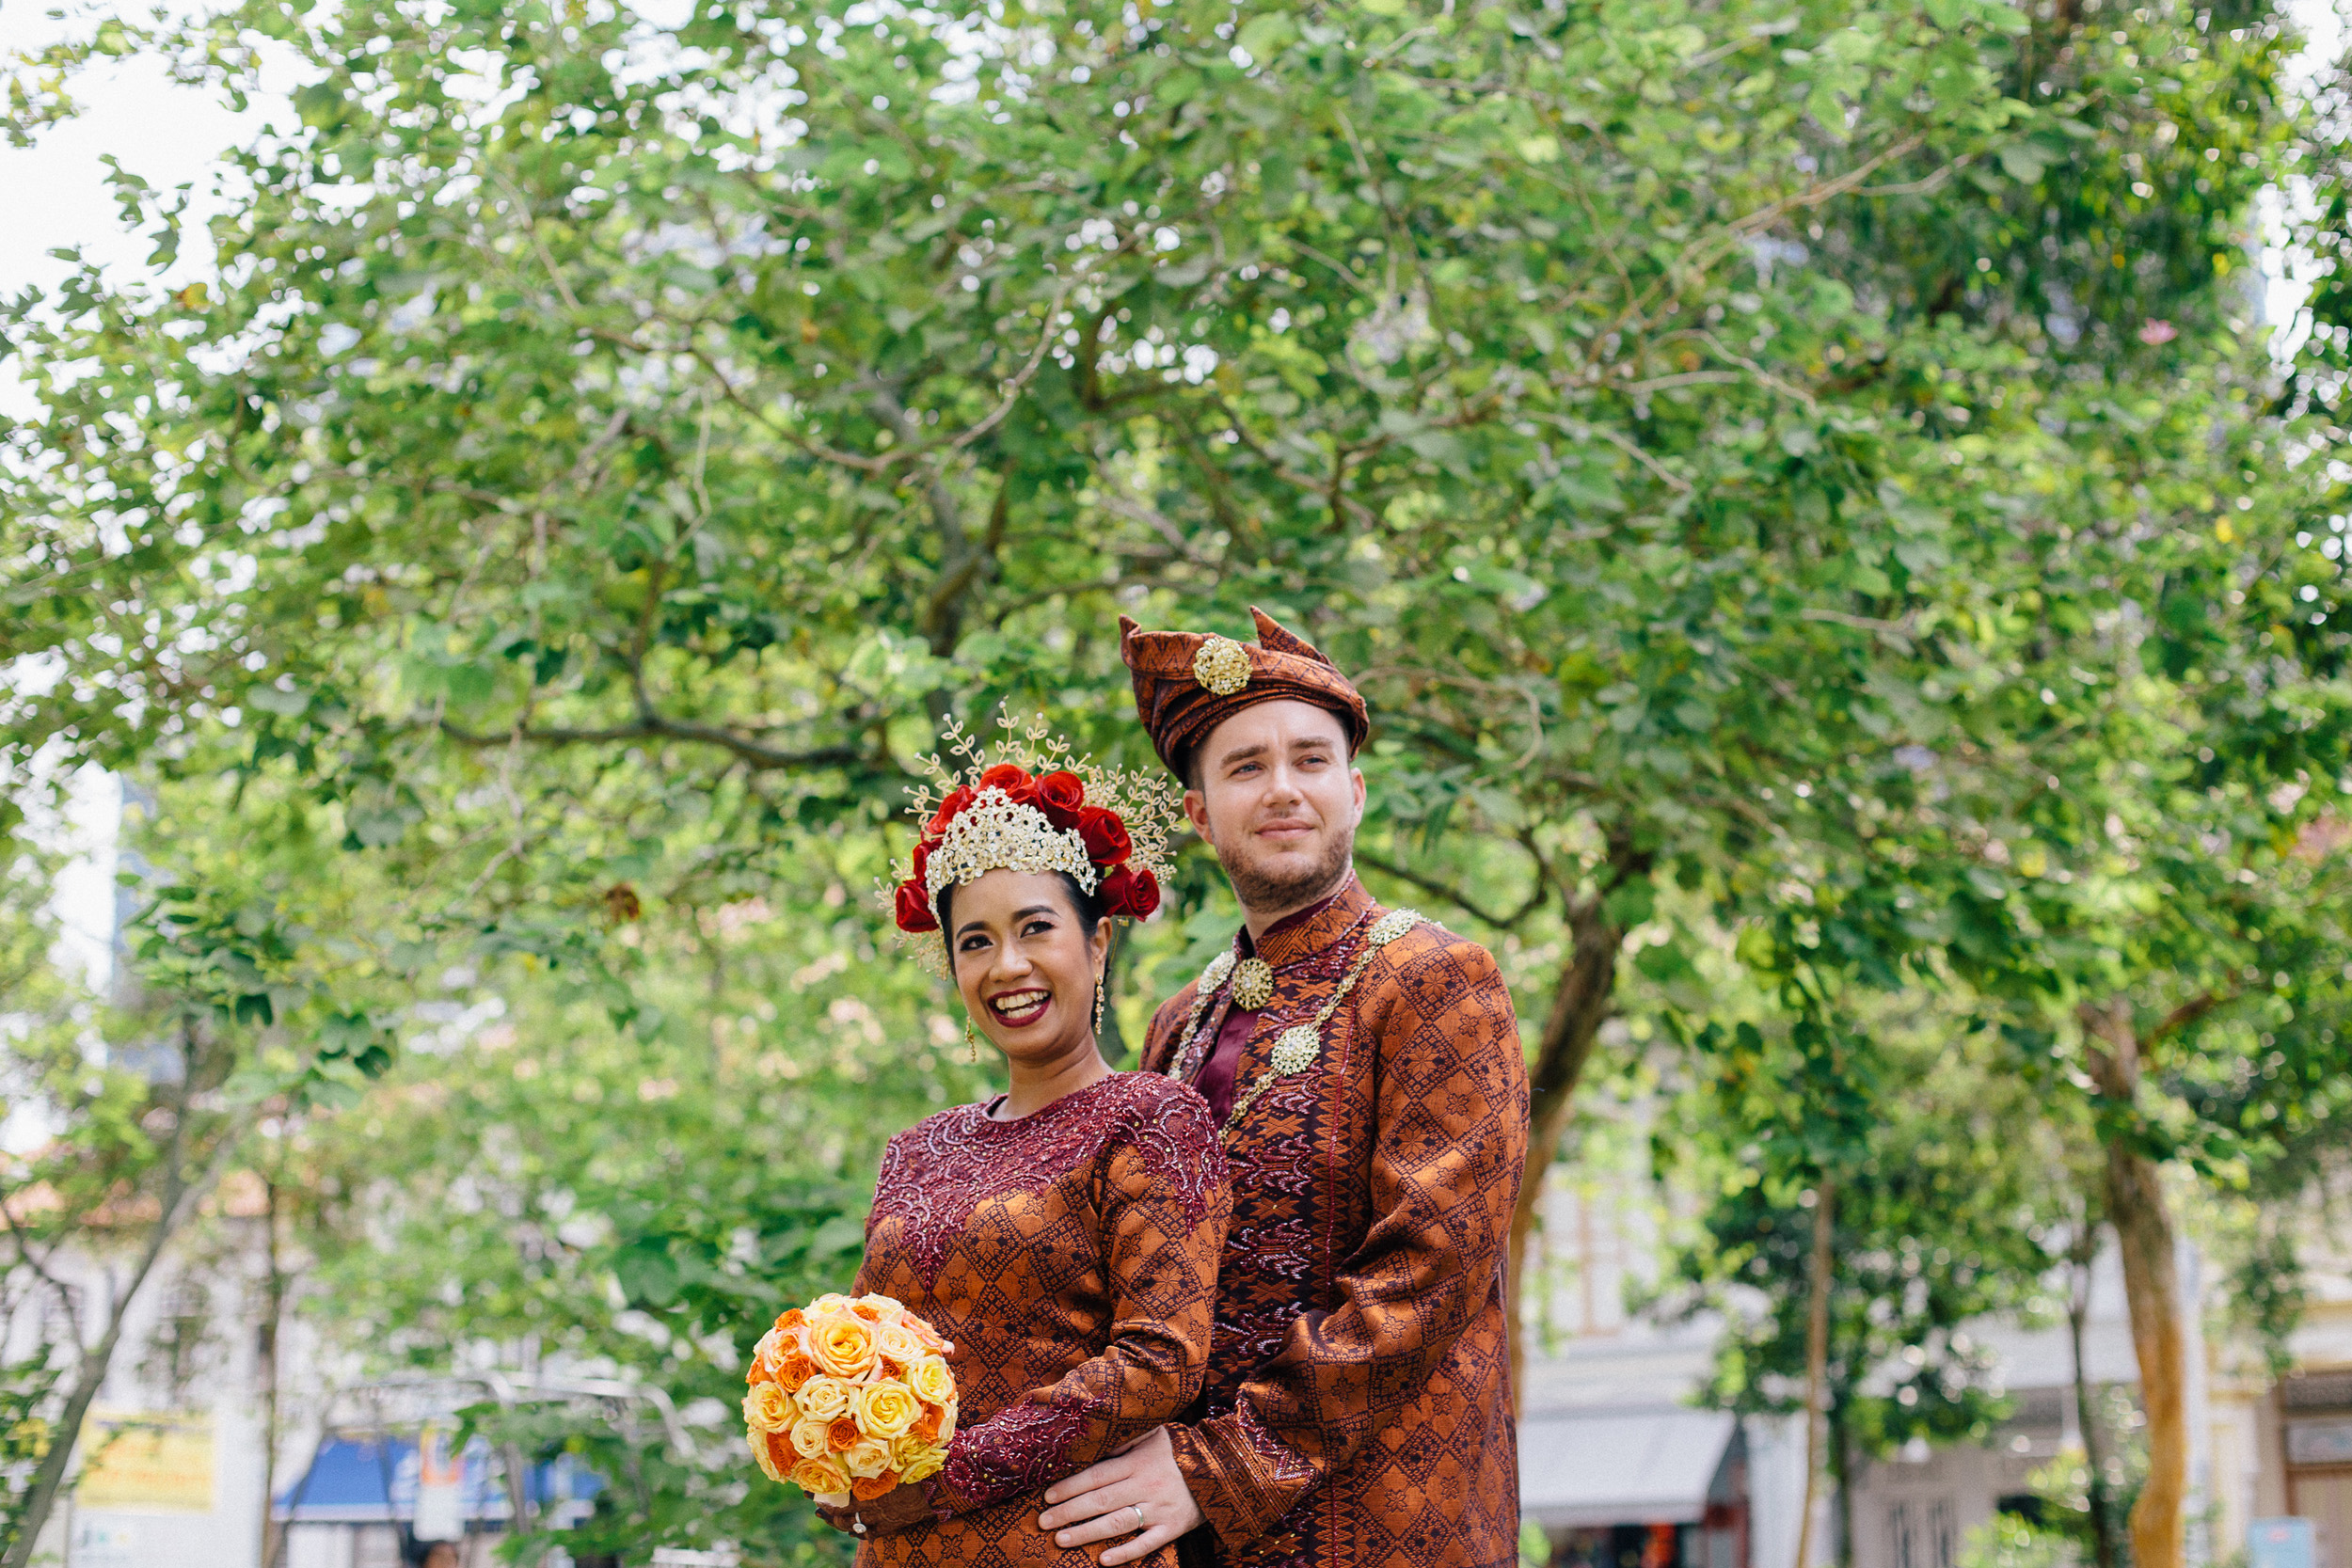 singapore-wedding-photographer-photography-wmt2017-137.jpg